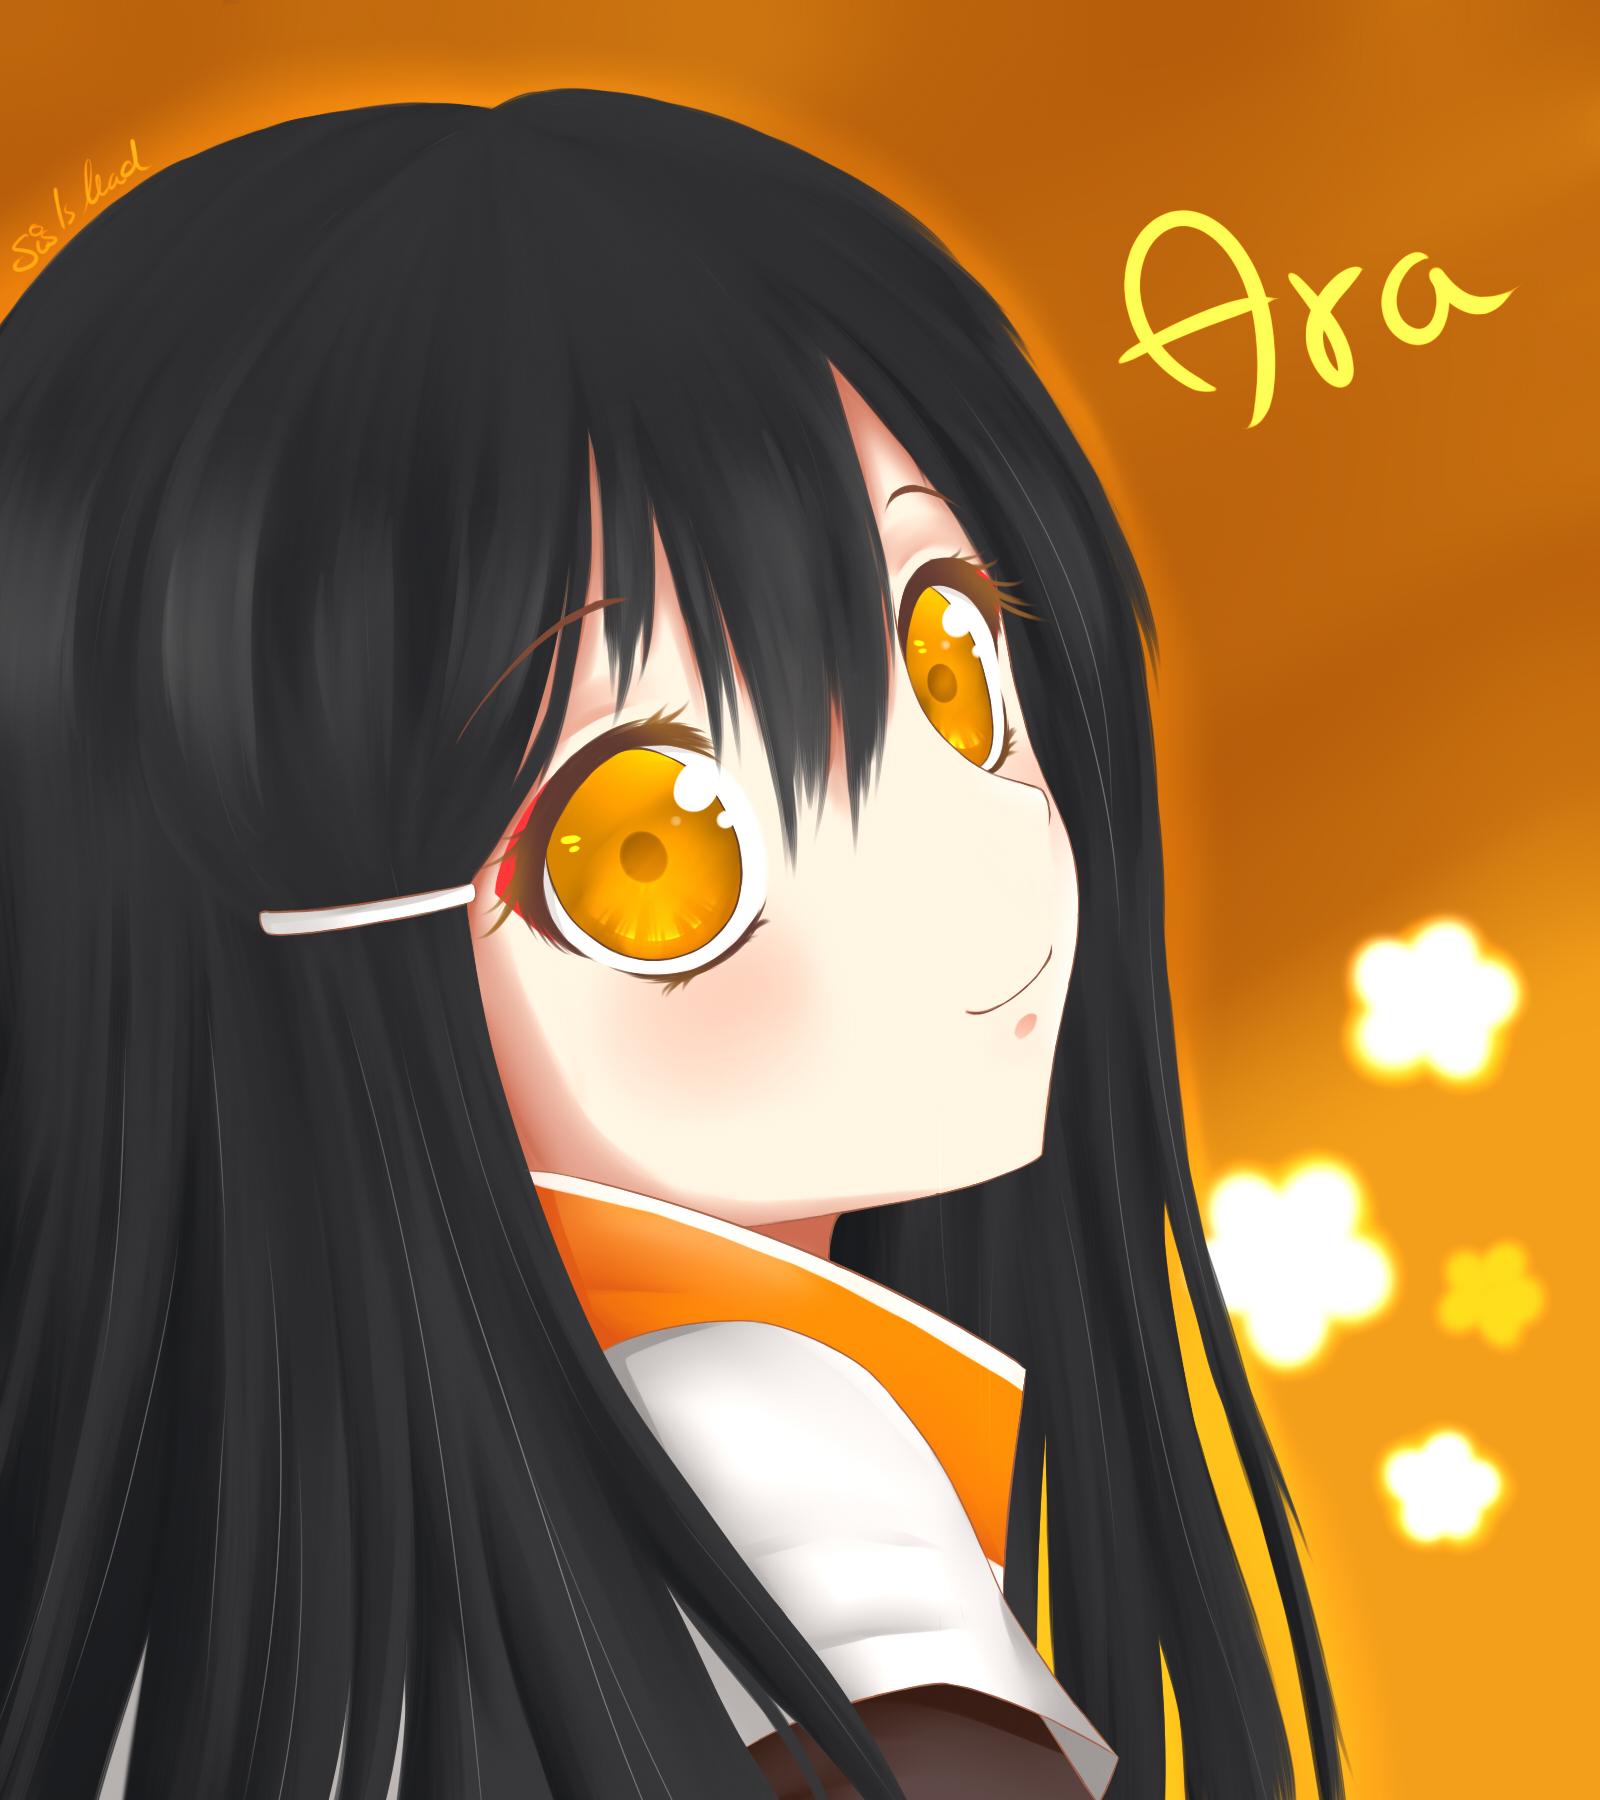 Ara Haan - Elsword | page 2 of 4 - Zerochan Anime Image Board